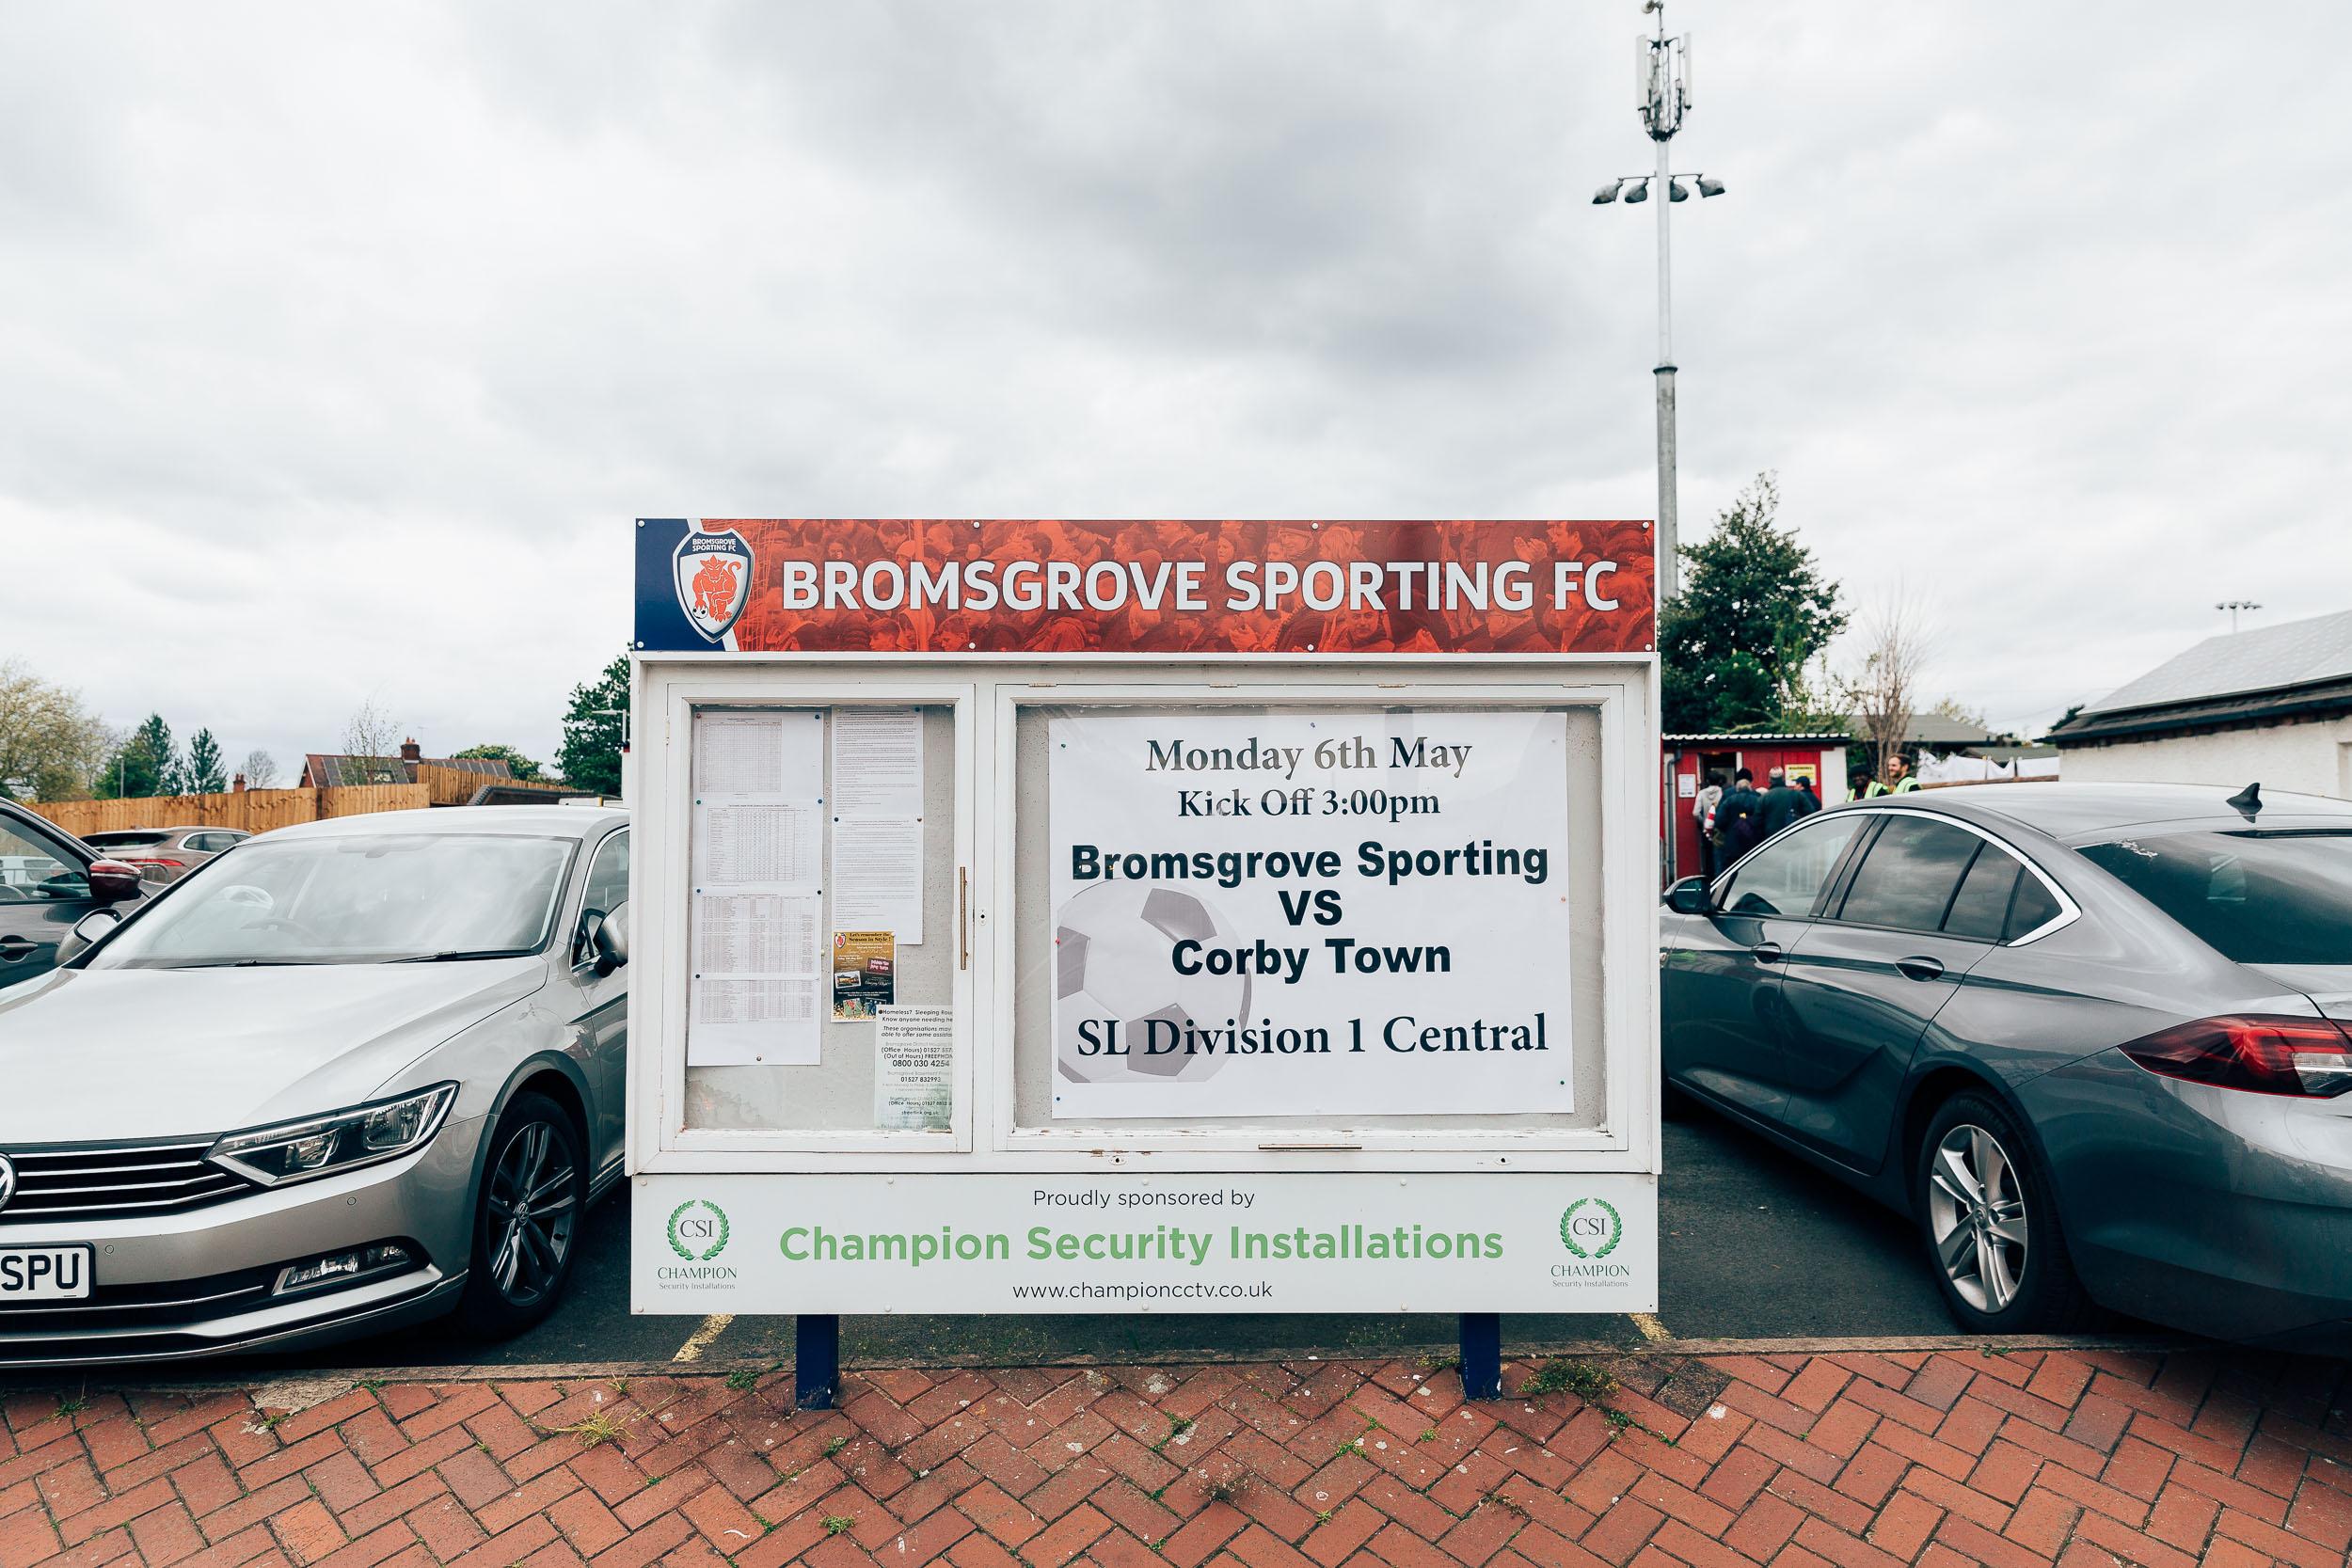 06_05_2019_Bromsgrove_Sporting_Corby-7.jpg